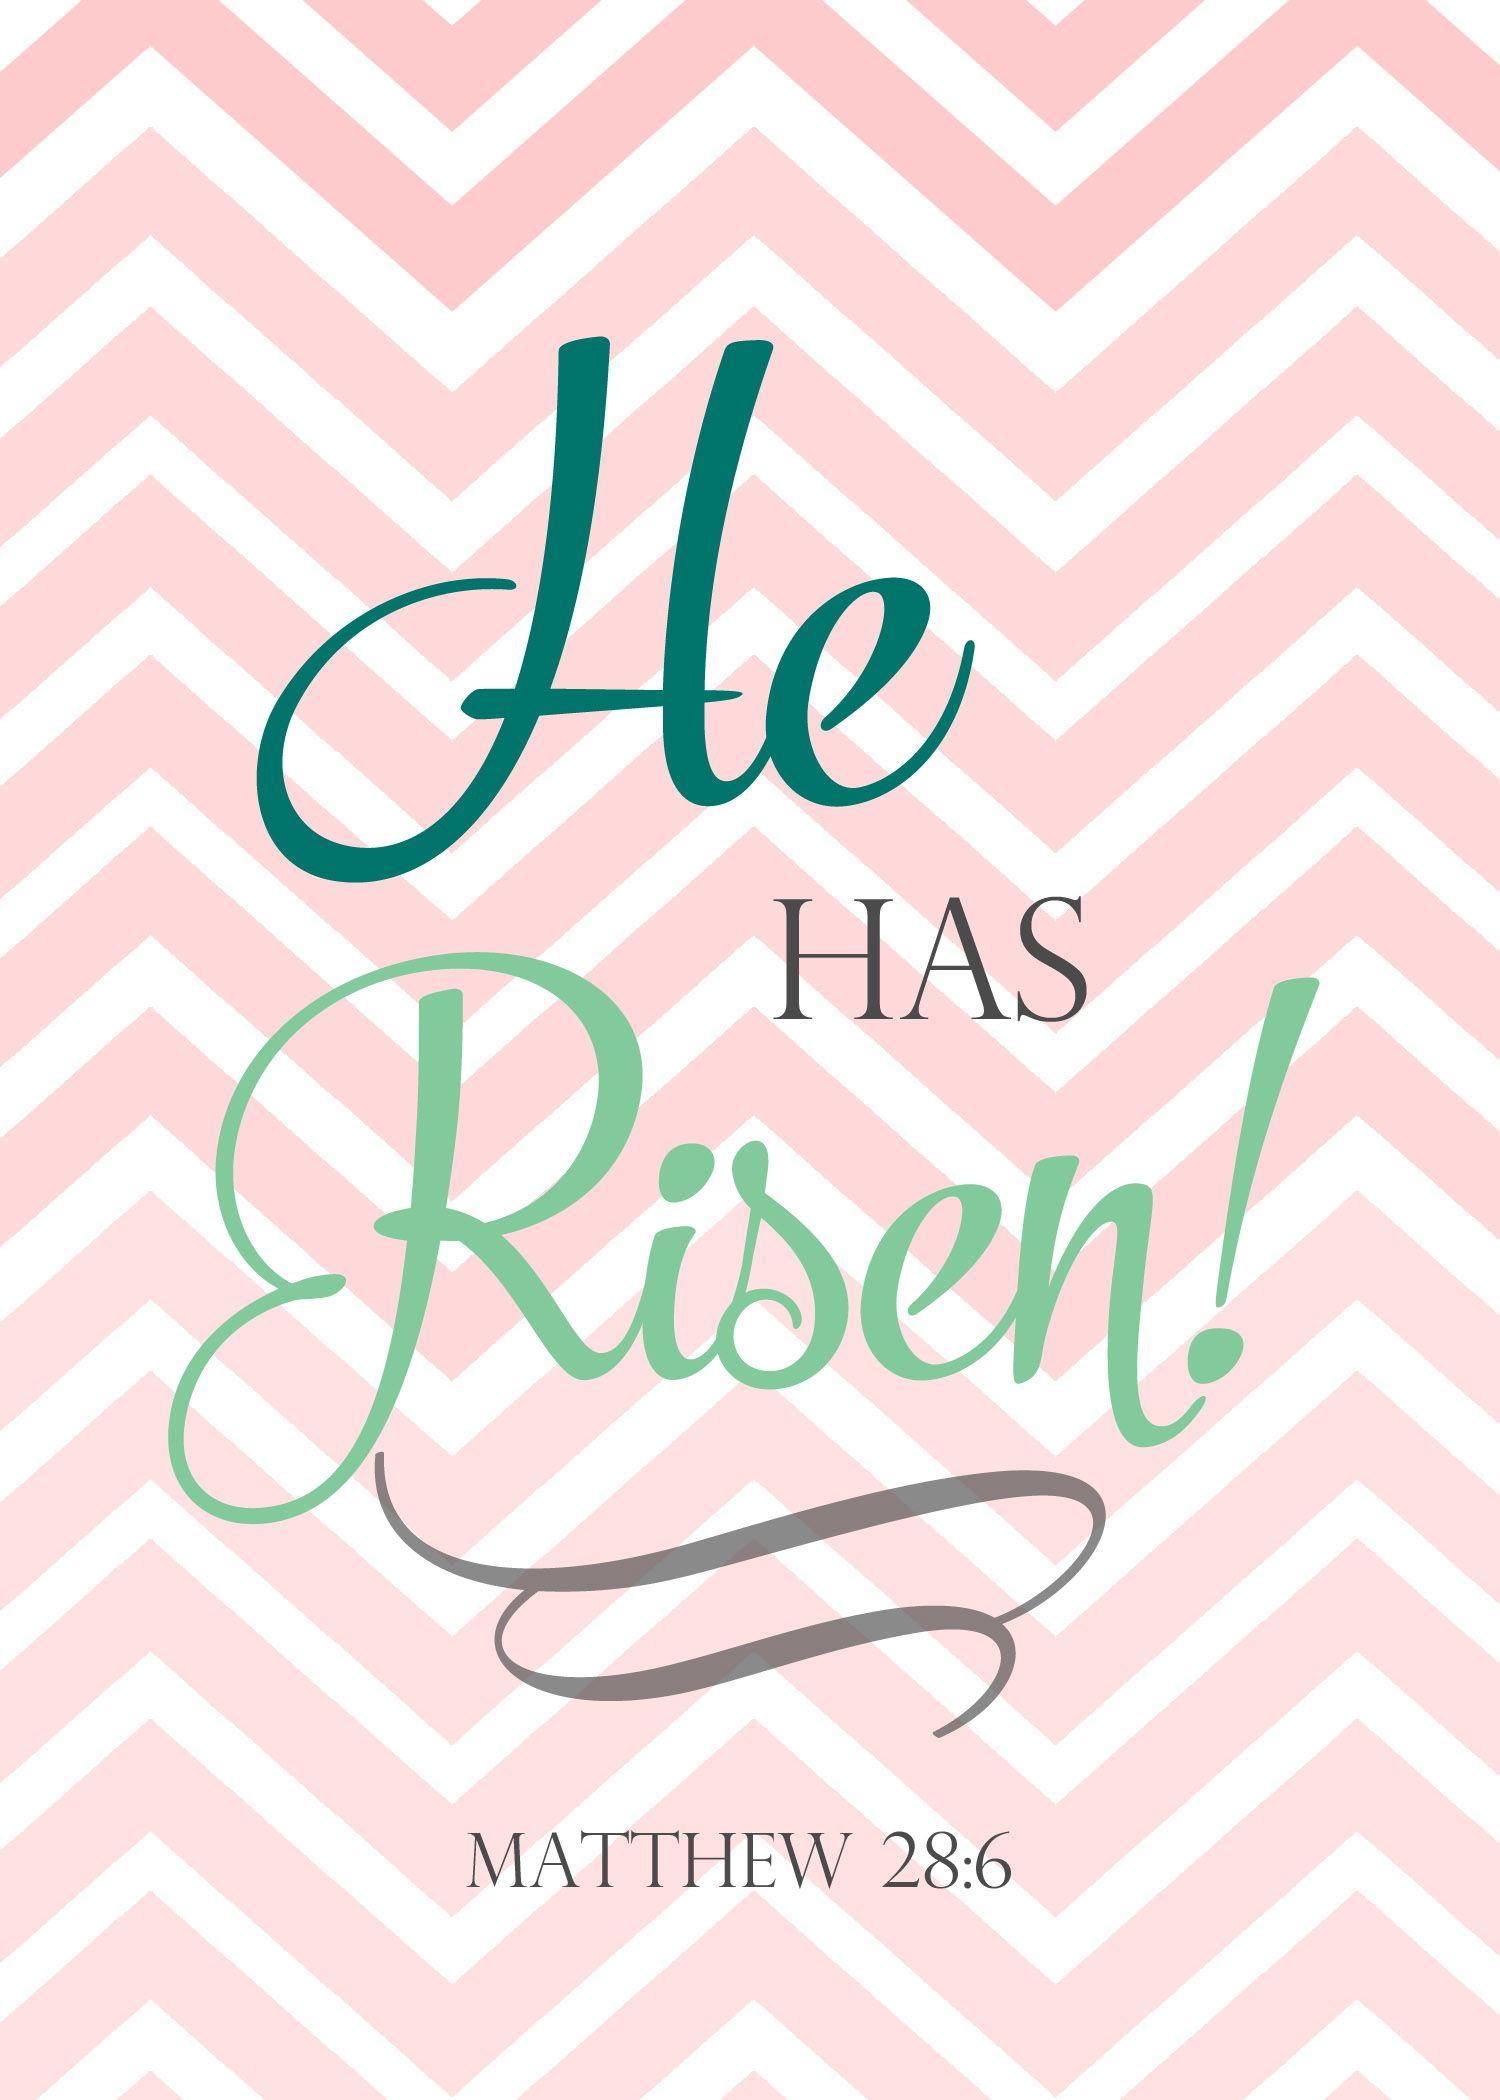 easter printable he is risen christian easter decorations wwwwildgracewomencom - Christian Easter Decorating Ideas